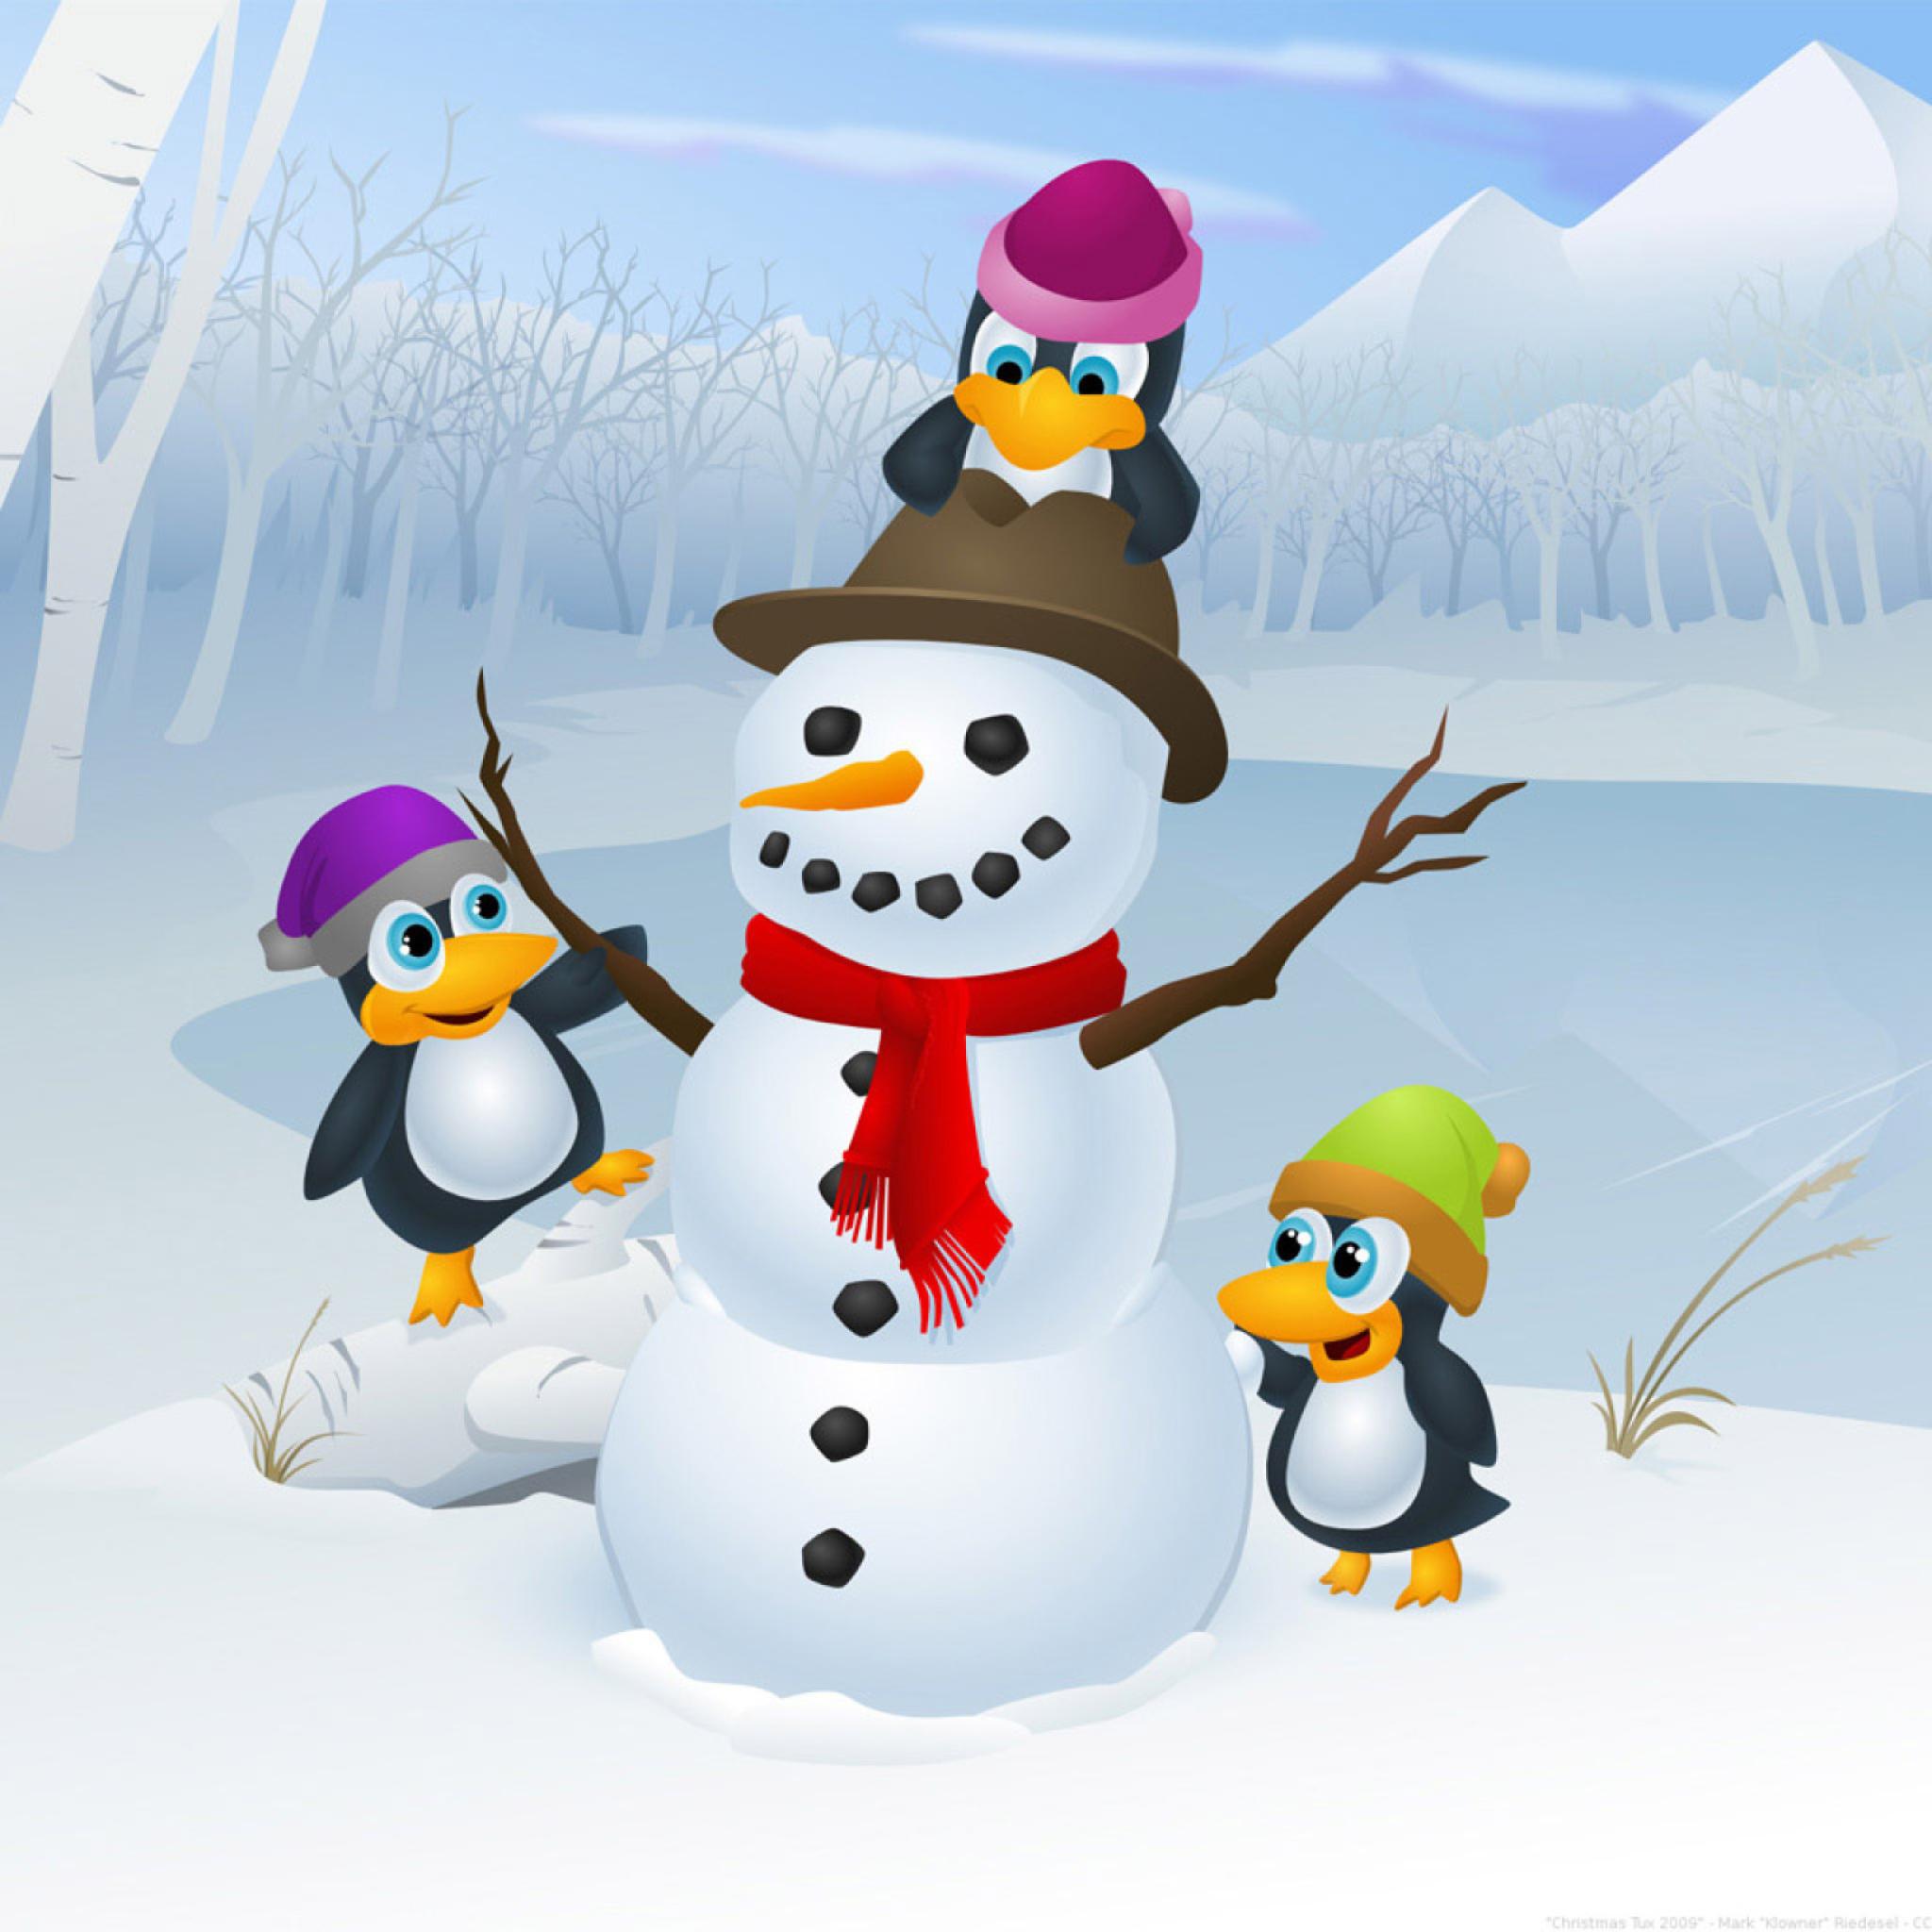 Картинка с снеговиком, курбаном татарском